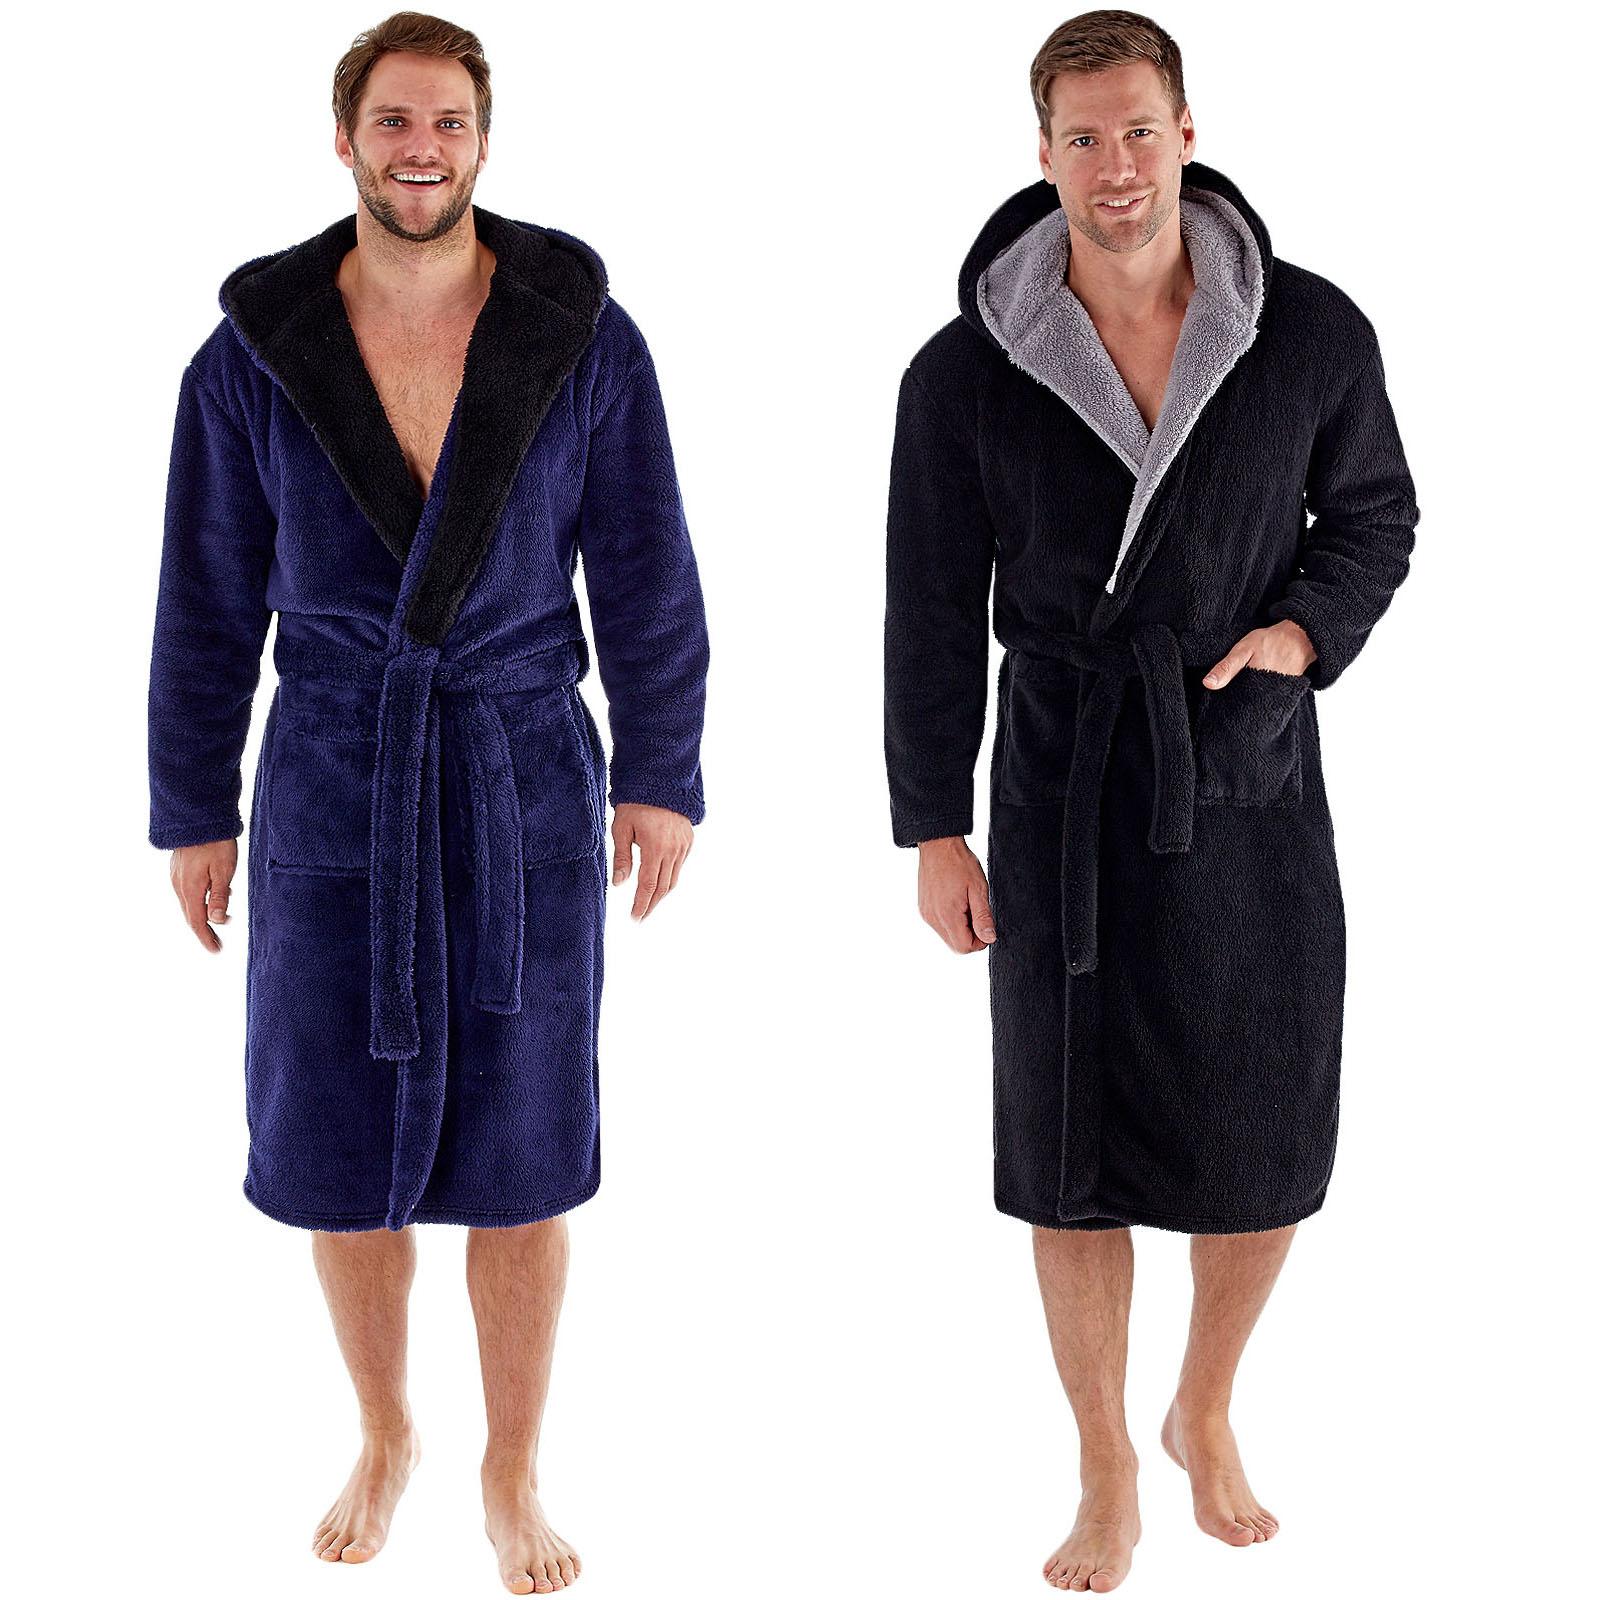 Harvey James Mens Super Soft Fleece Hooded Lounge Robe Dressing Gown ...